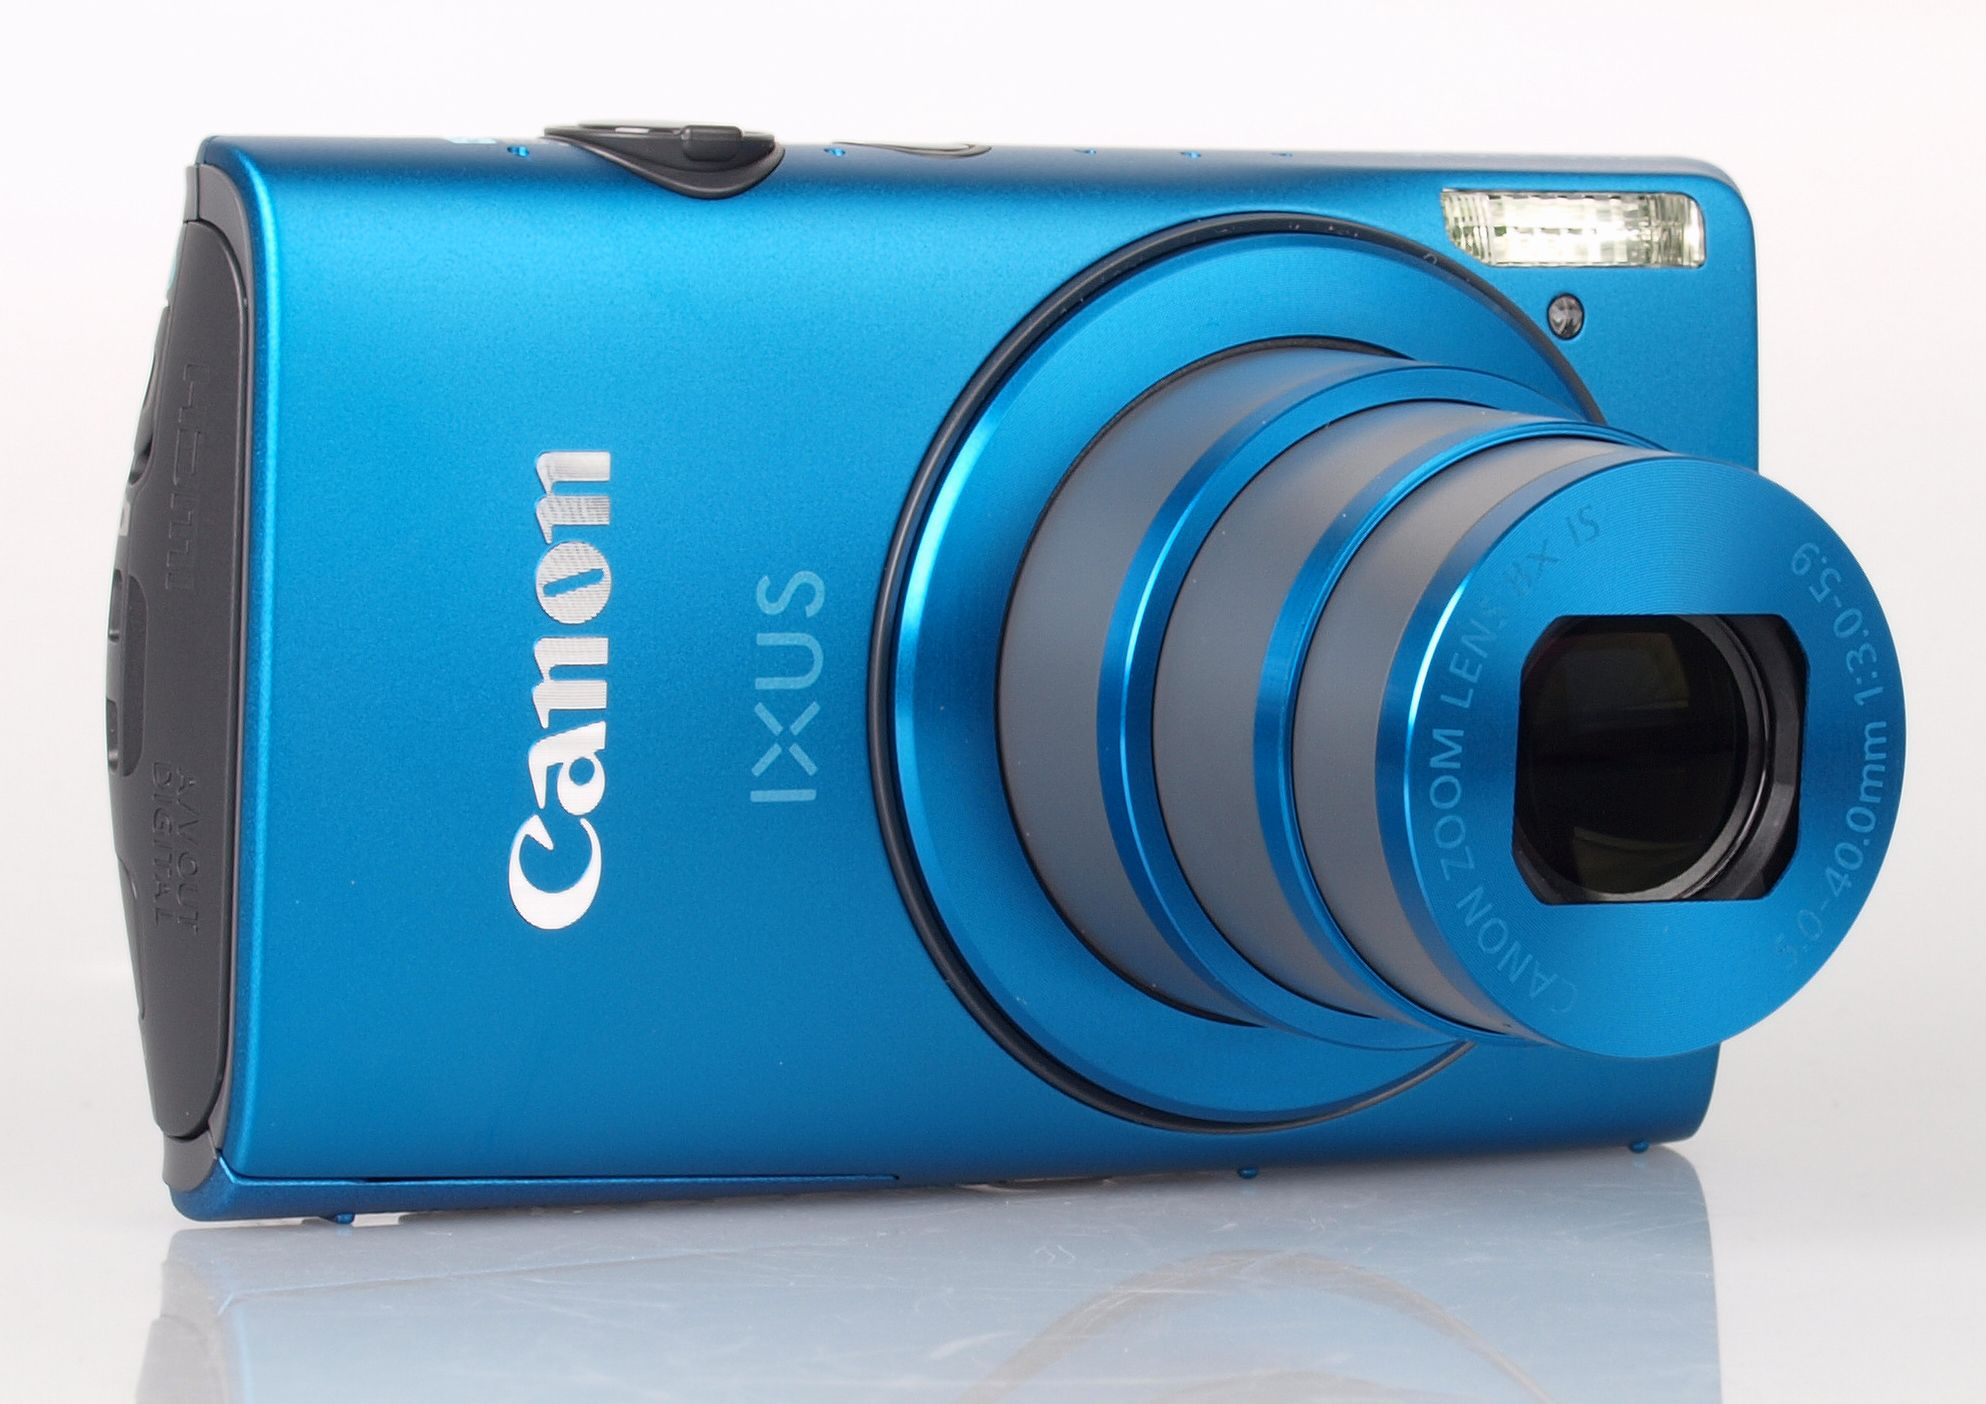 Canon Digital Camera Reviews | Canon IXUS 230 HS Digital Camera Review